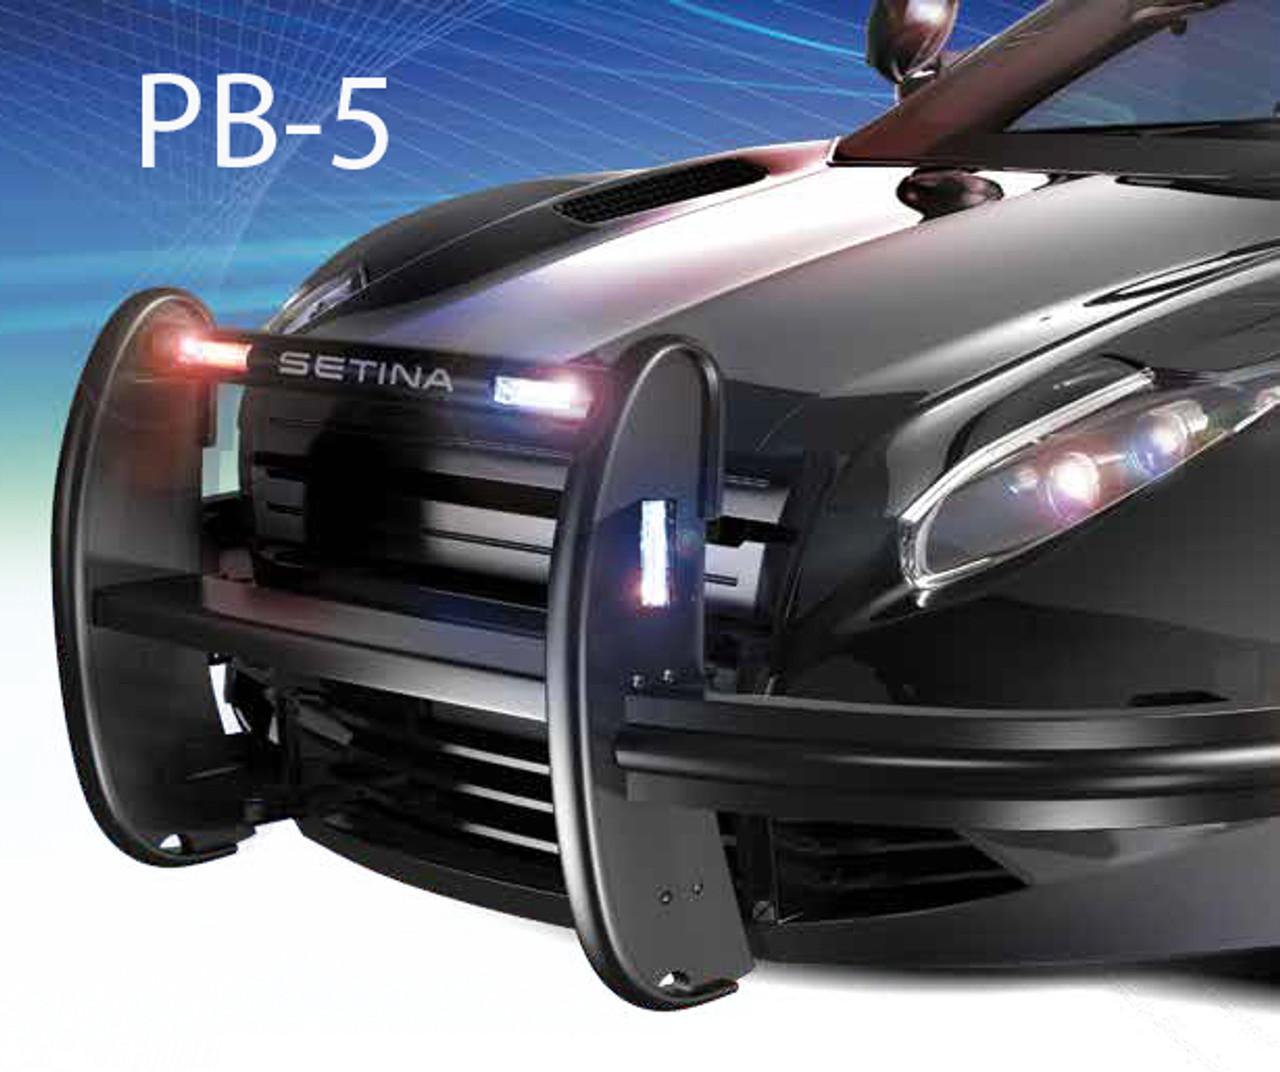 Setina Push Bumper with Fender Wrap PB5 + PB400 for Cars SUVs Trucks and Vans